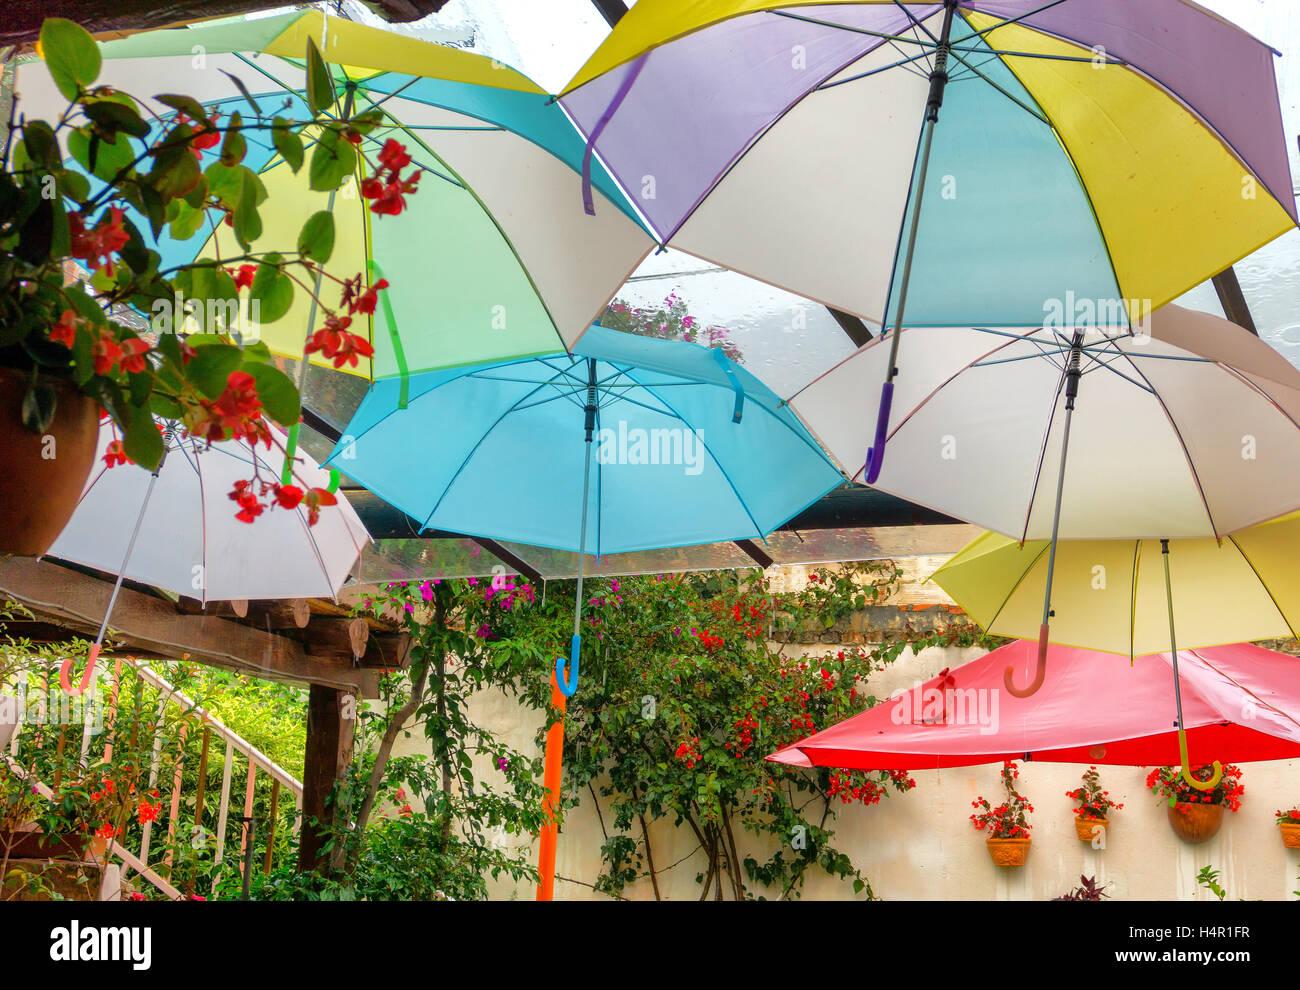 Bunte Schirme hängen in Villa de Leyva, Kolumbien Stockbild